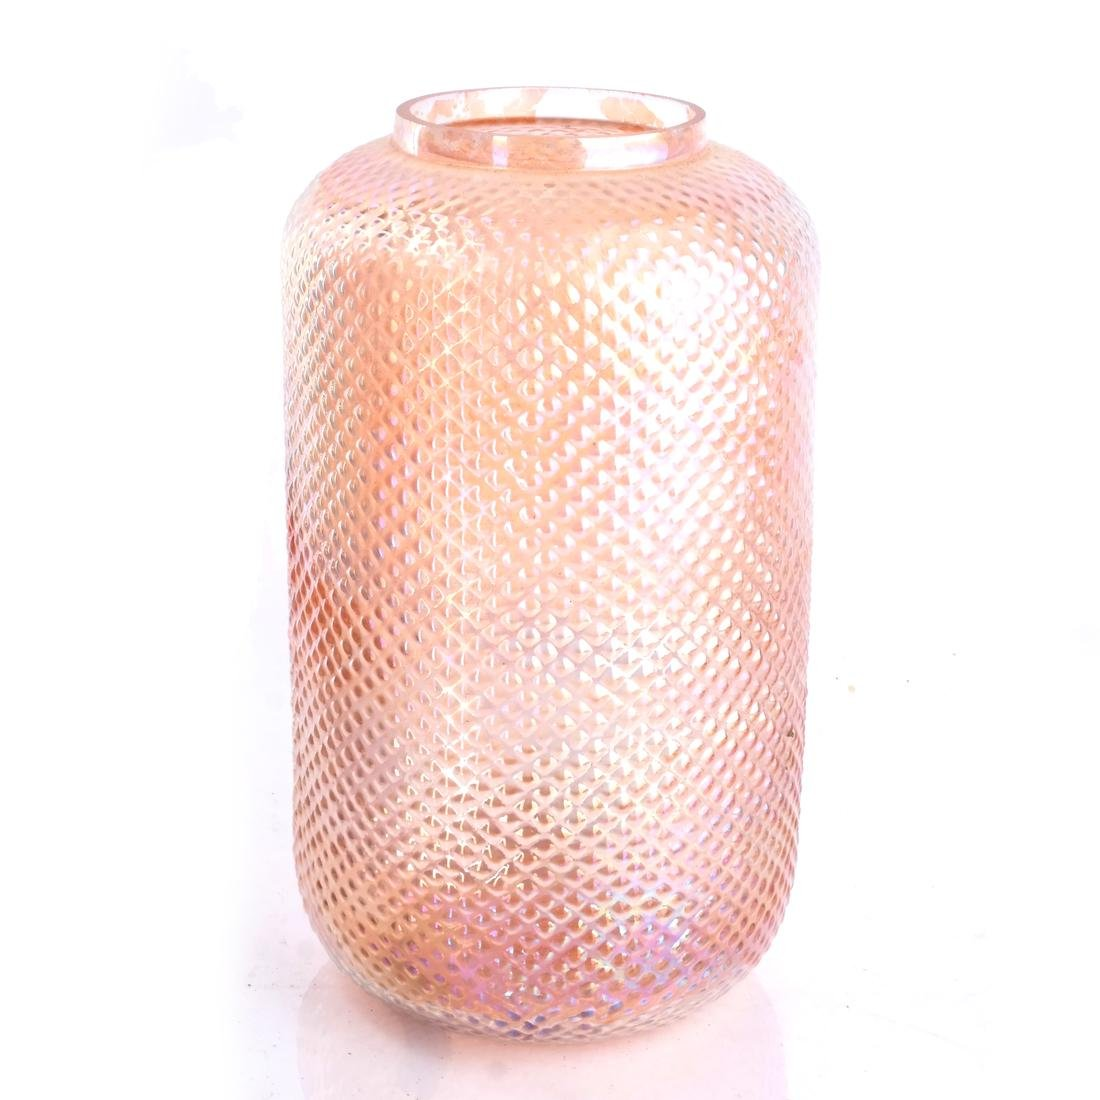 Pair of Depression Glass Vases - 2